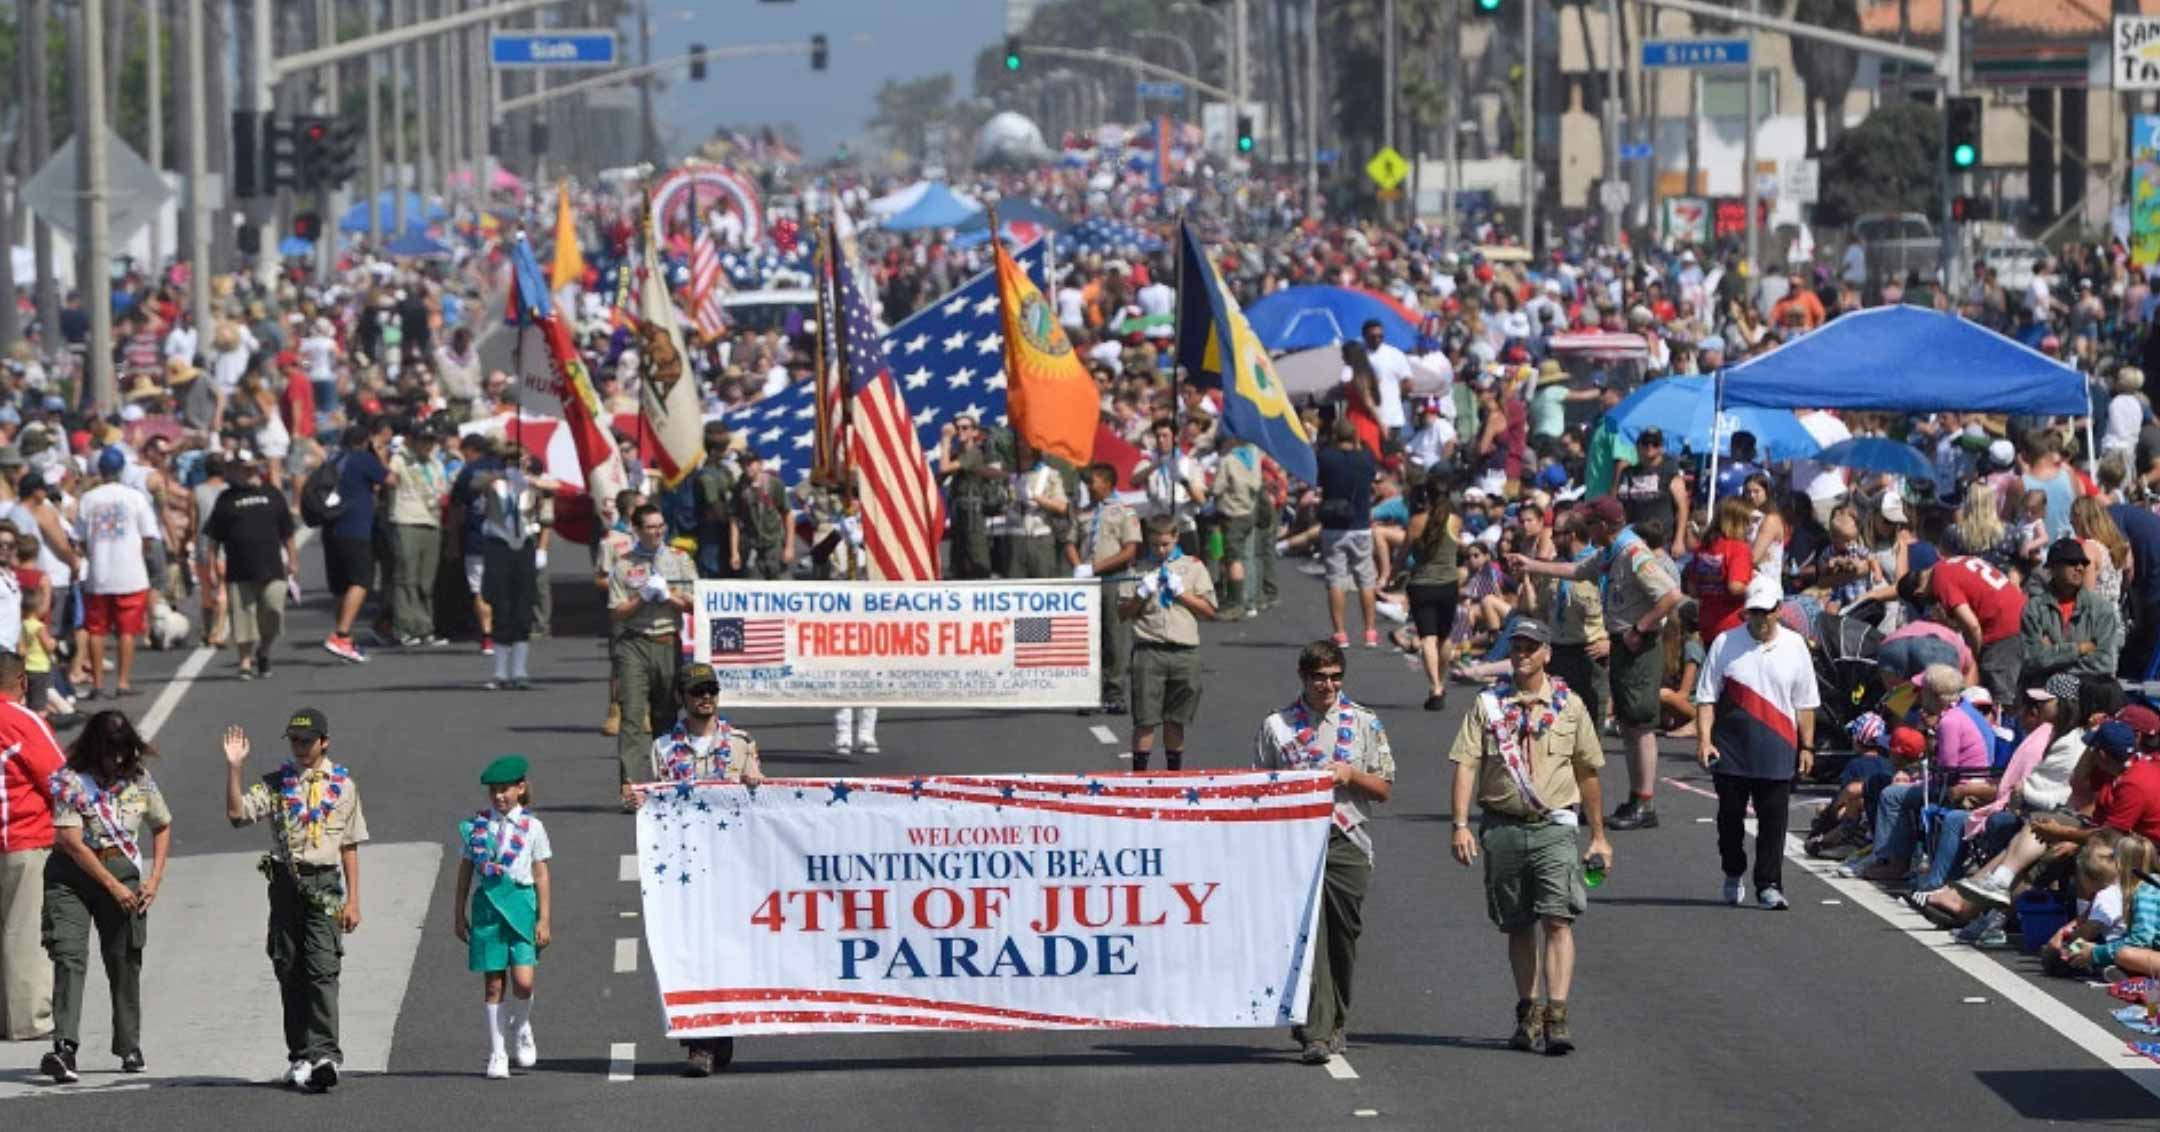 Huntington Beach 4th of July Parade | Orange County DeLorean